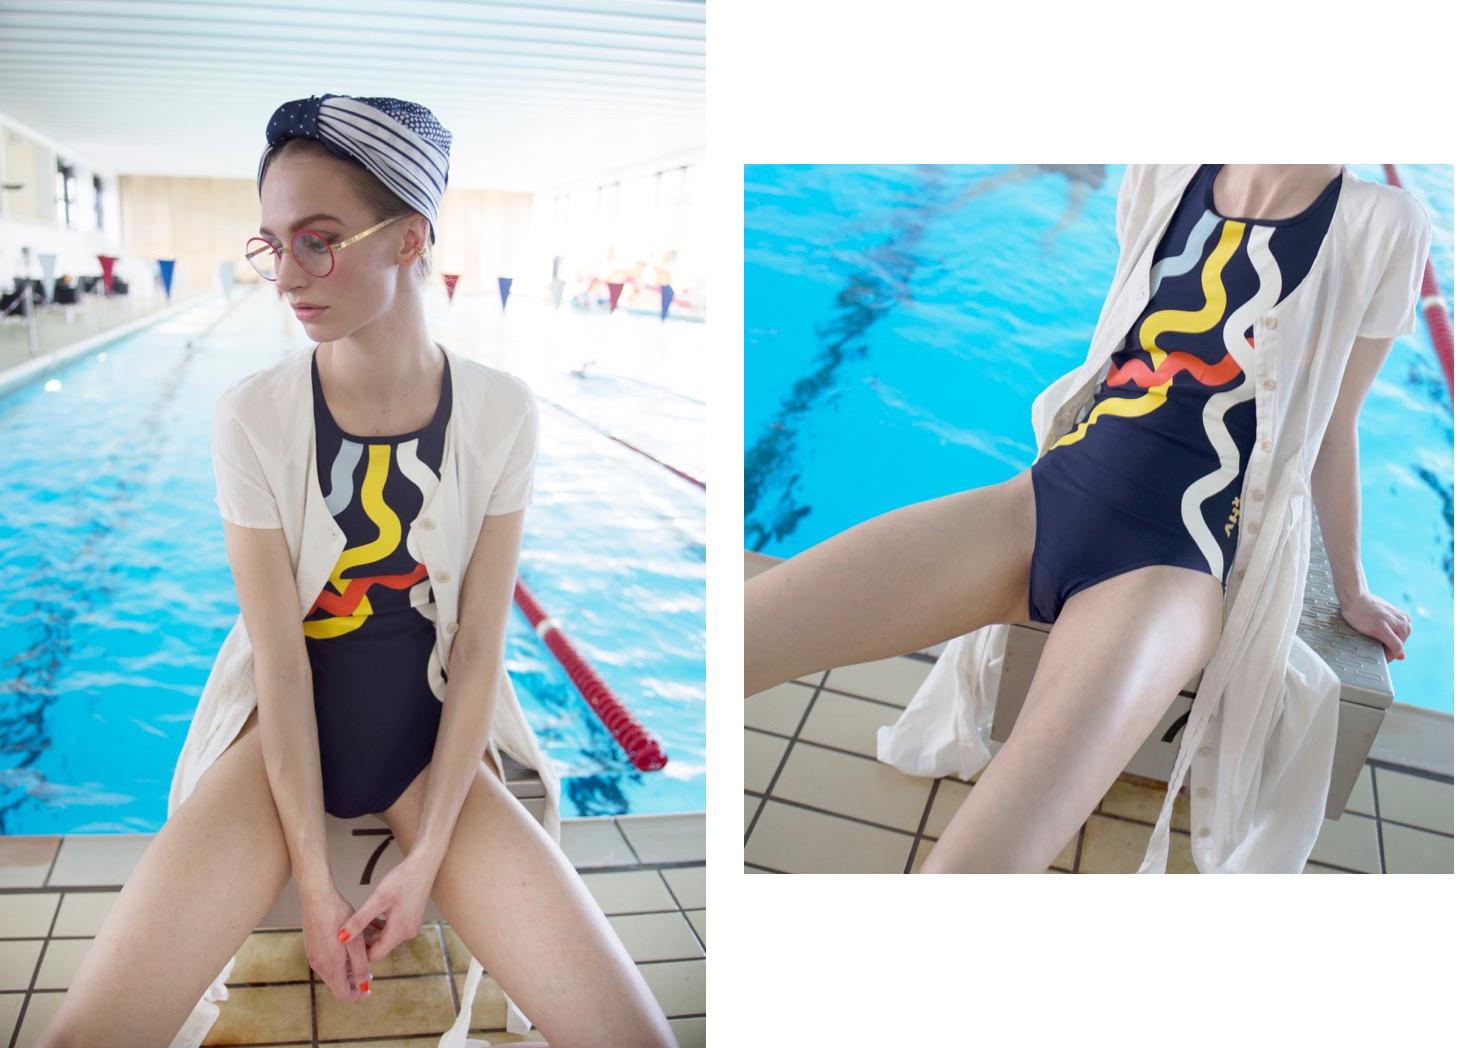 swim-shoot-styling-marie-my-nemesis-babe-photo-maria-thornfeldt-model-nathalie-ostergaard-1